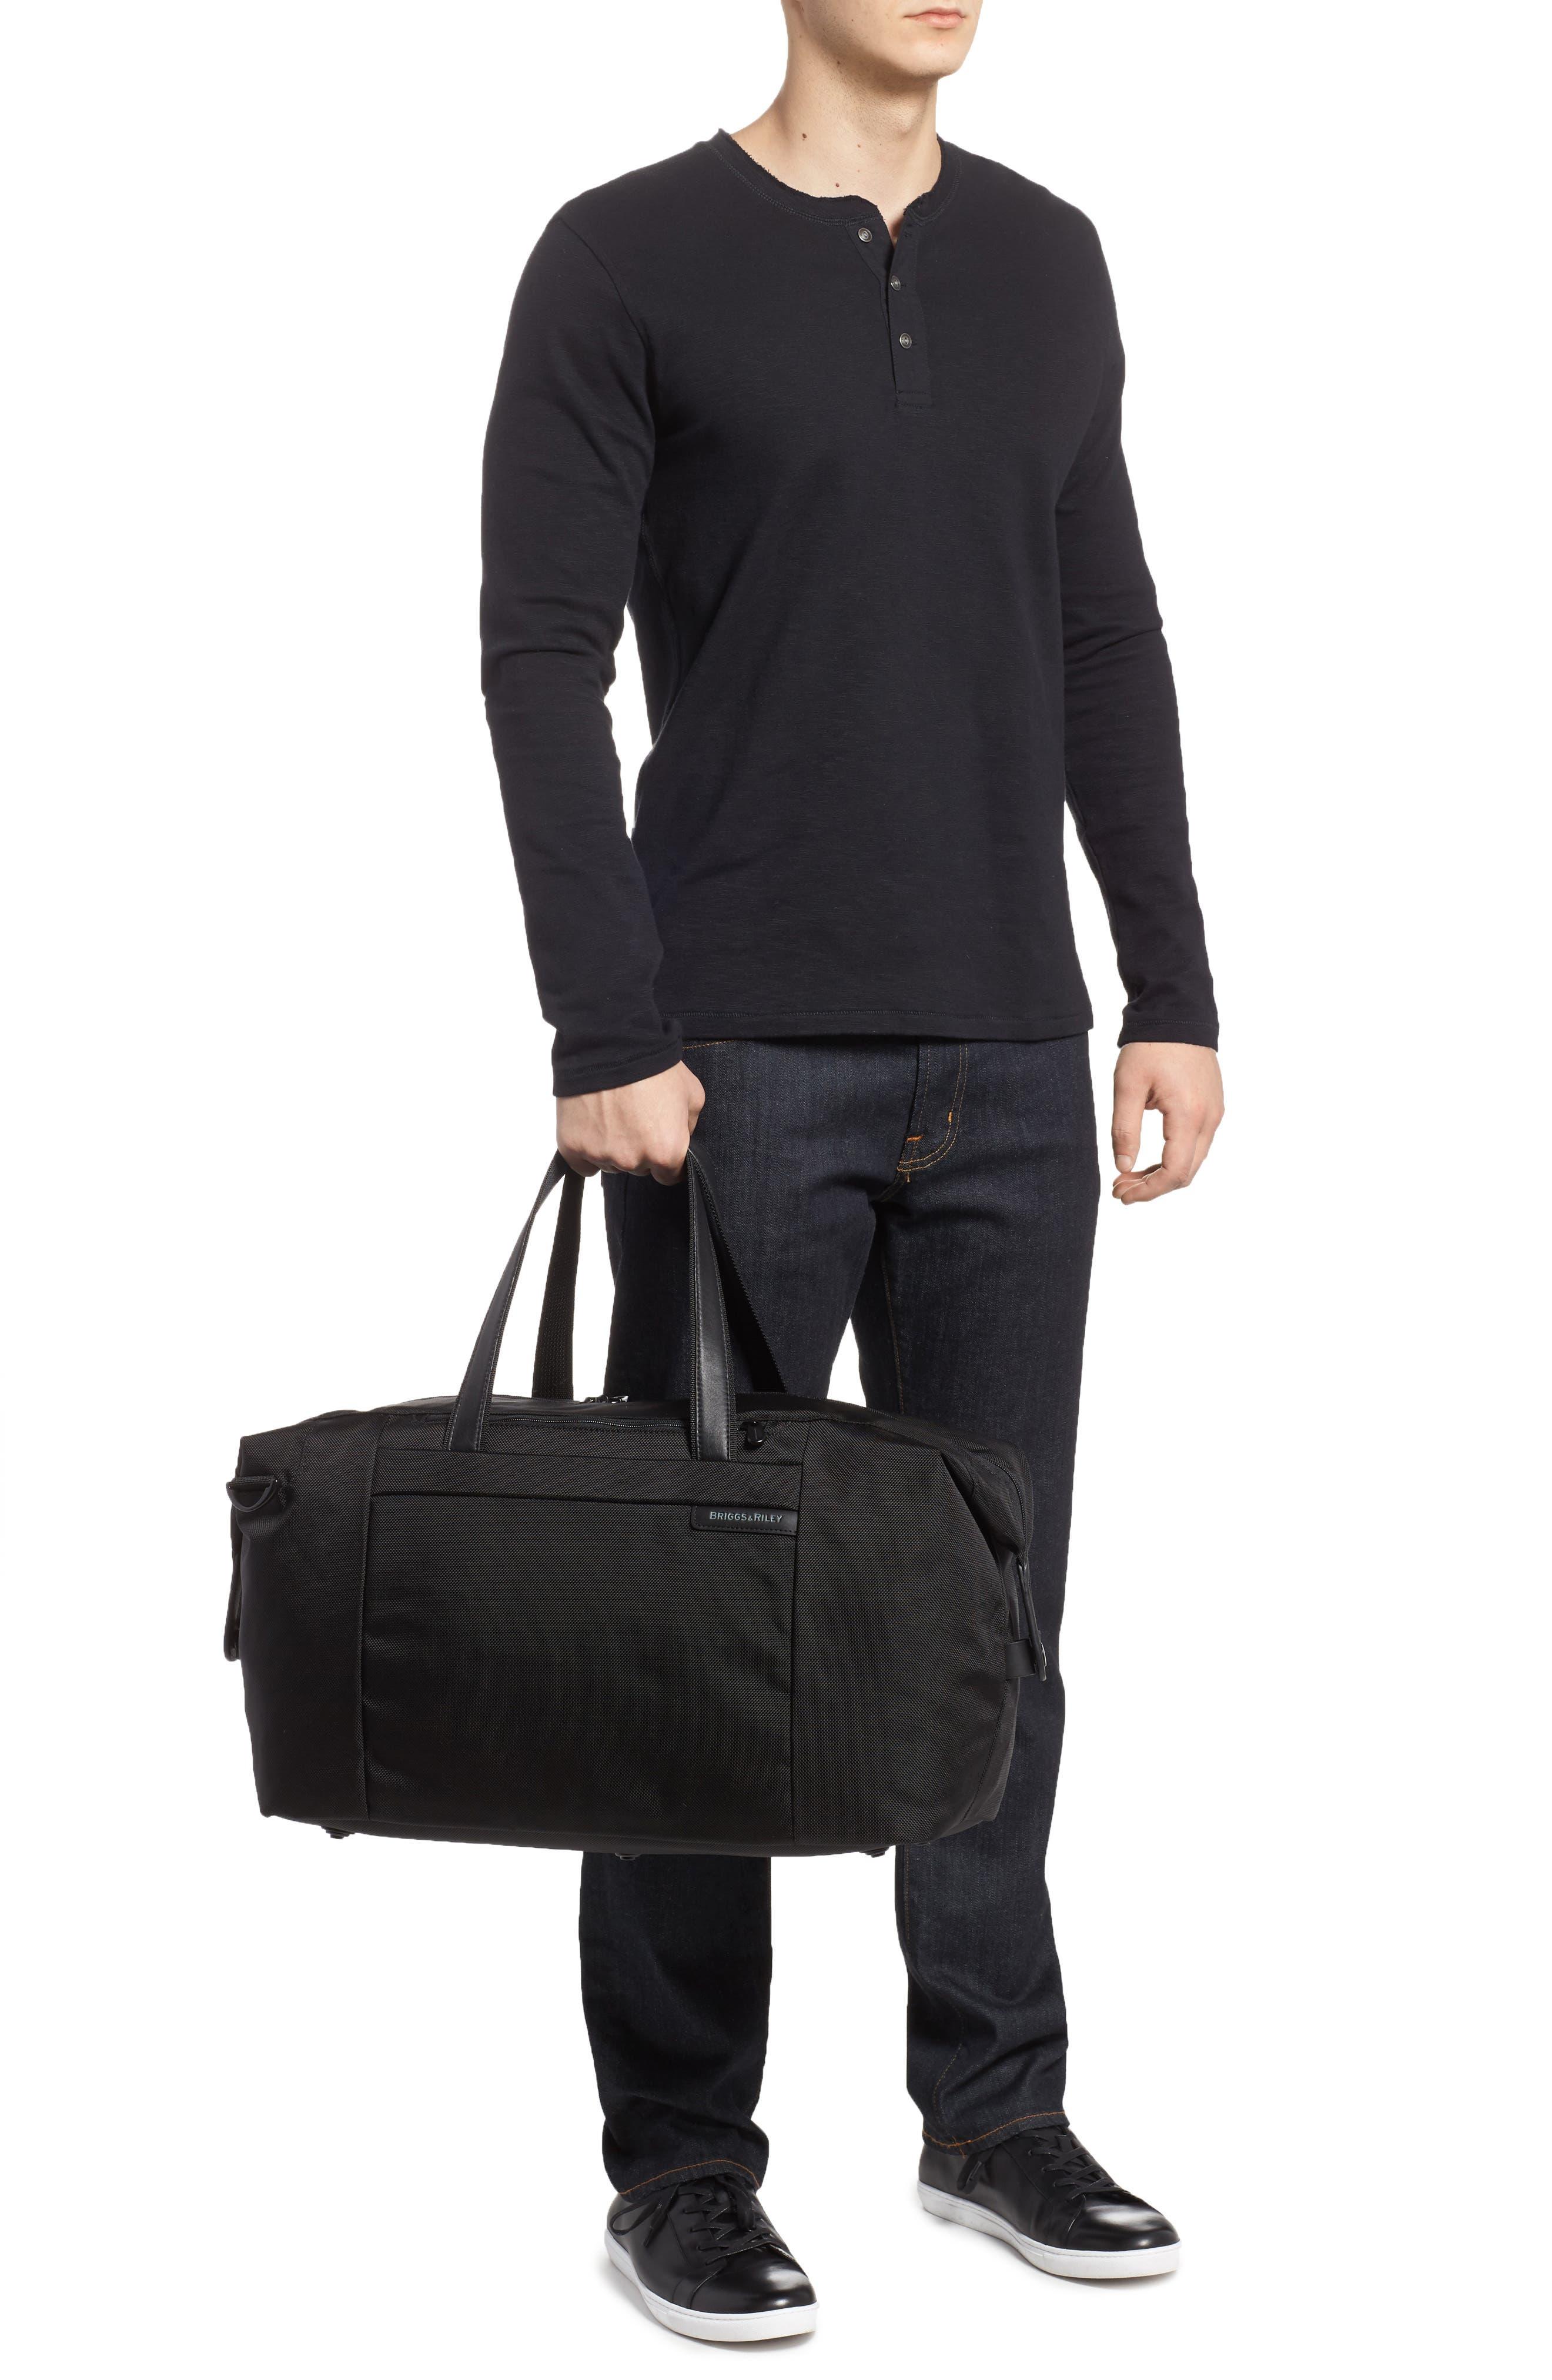 BRIGGS & RILEY,                             'Baseline' Duffel Bag,                             Alternate thumbnail 2, color,                             BLACK